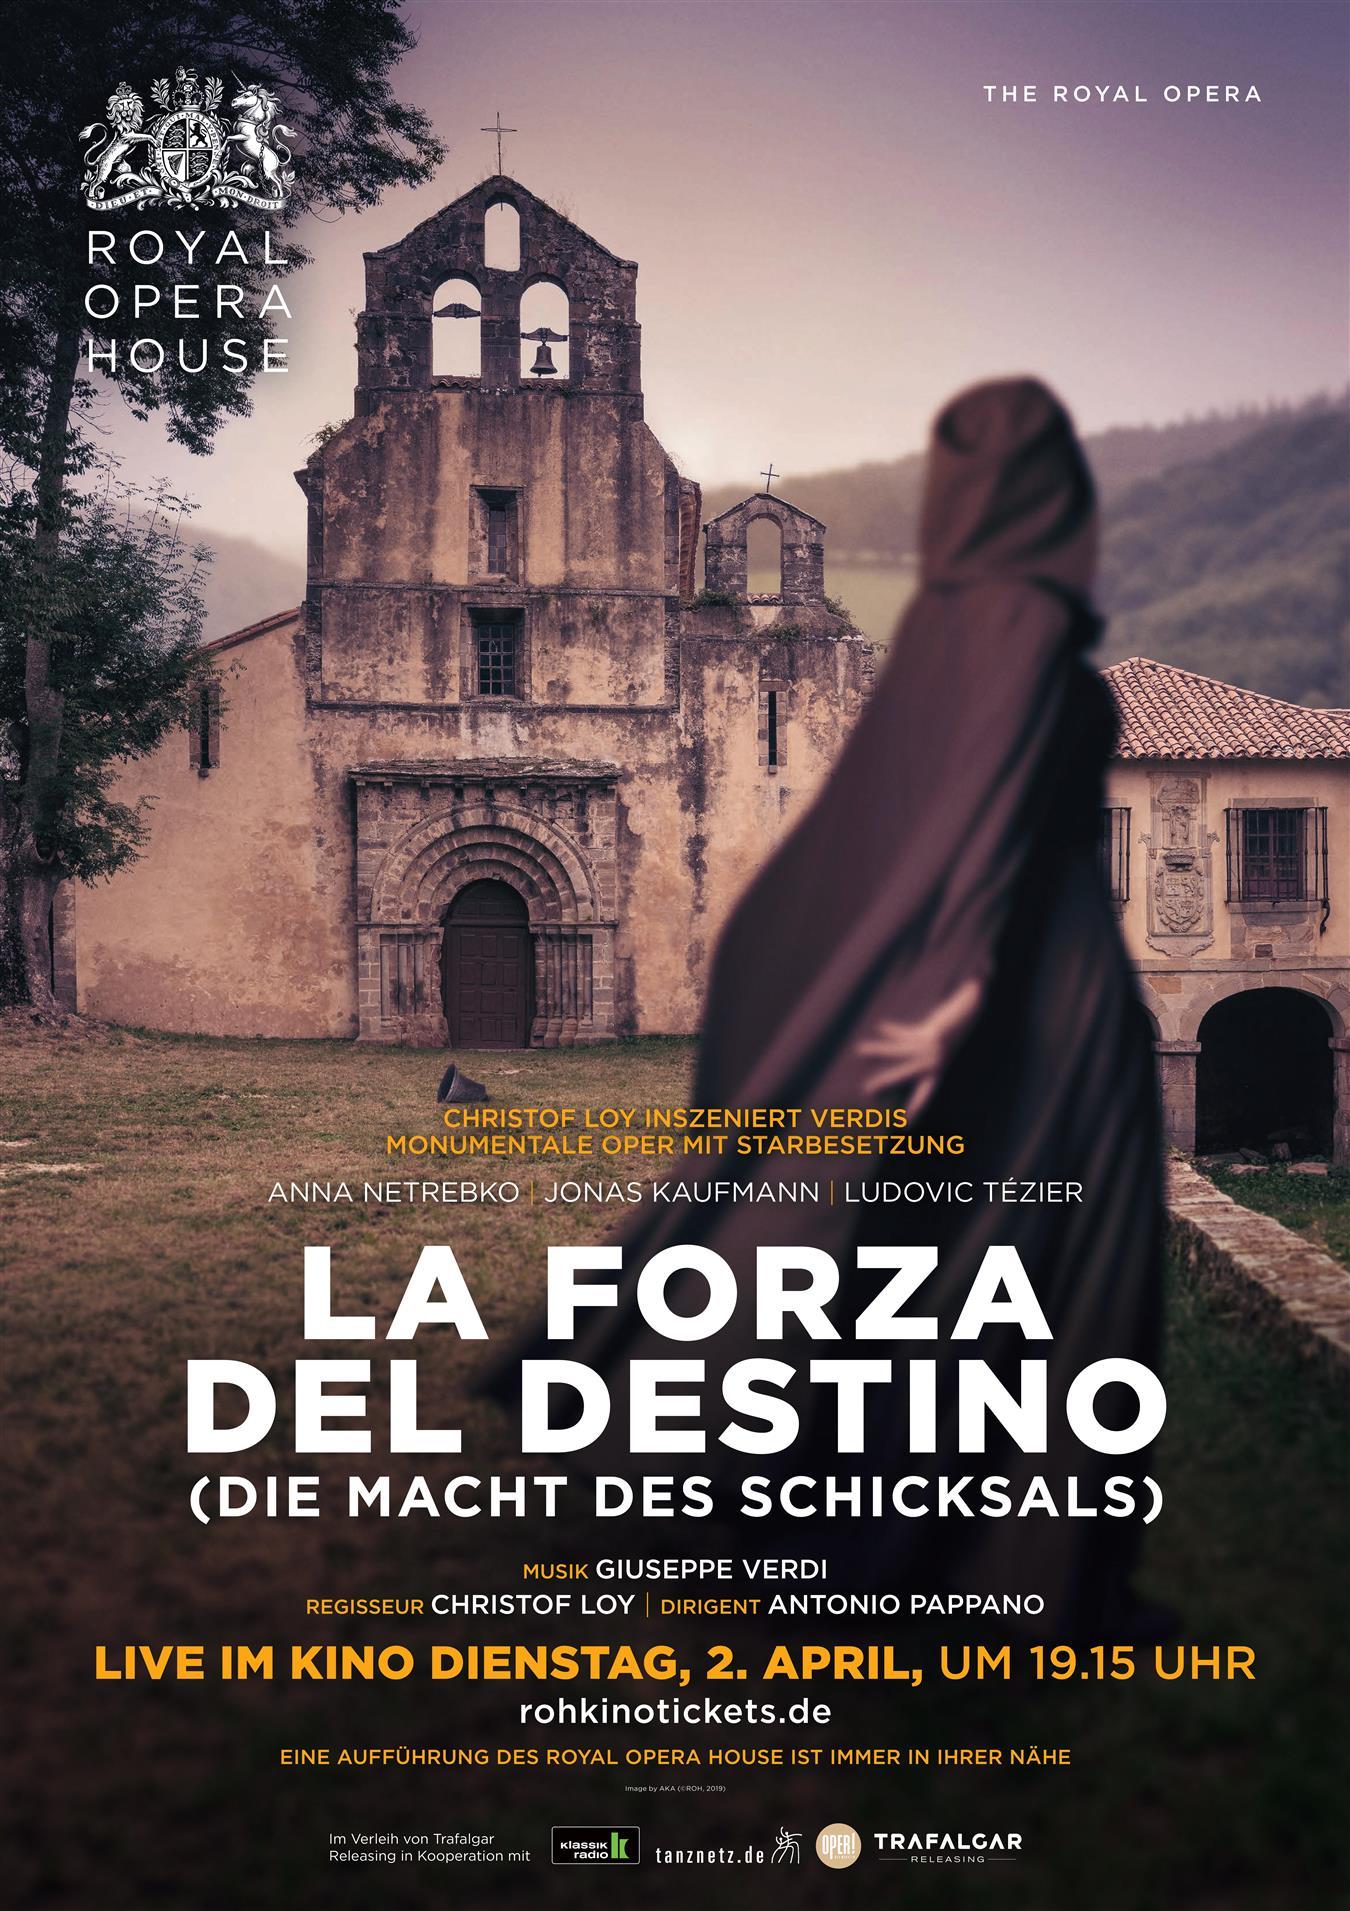 ROH Verdi LA FORZA DEL DESTINO (DIE MACHT DES SCHICKSALS)